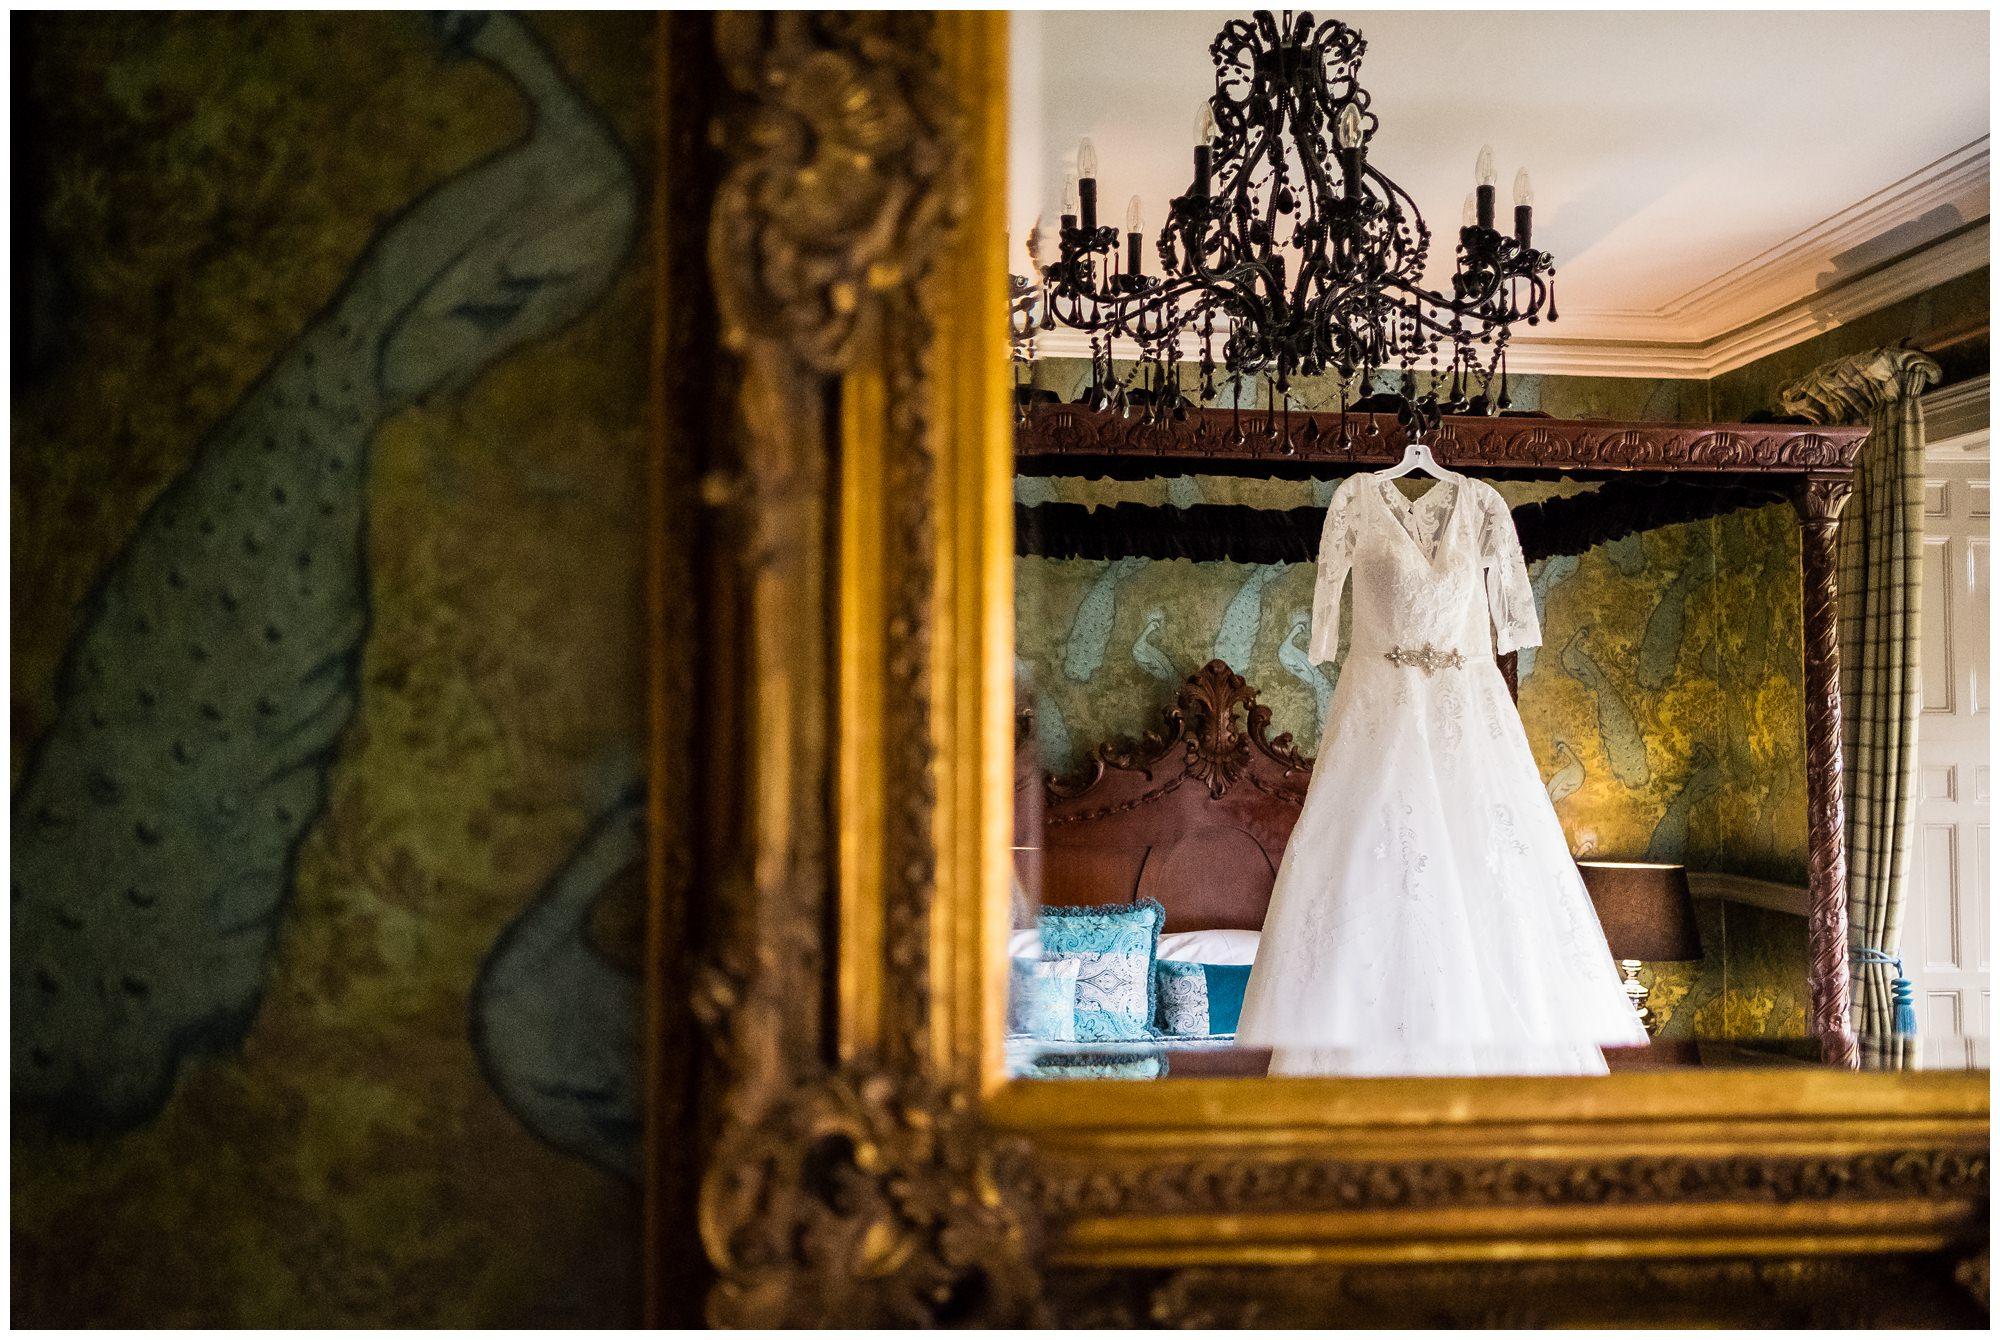 wedding dress hung at mitton hall, lancashire